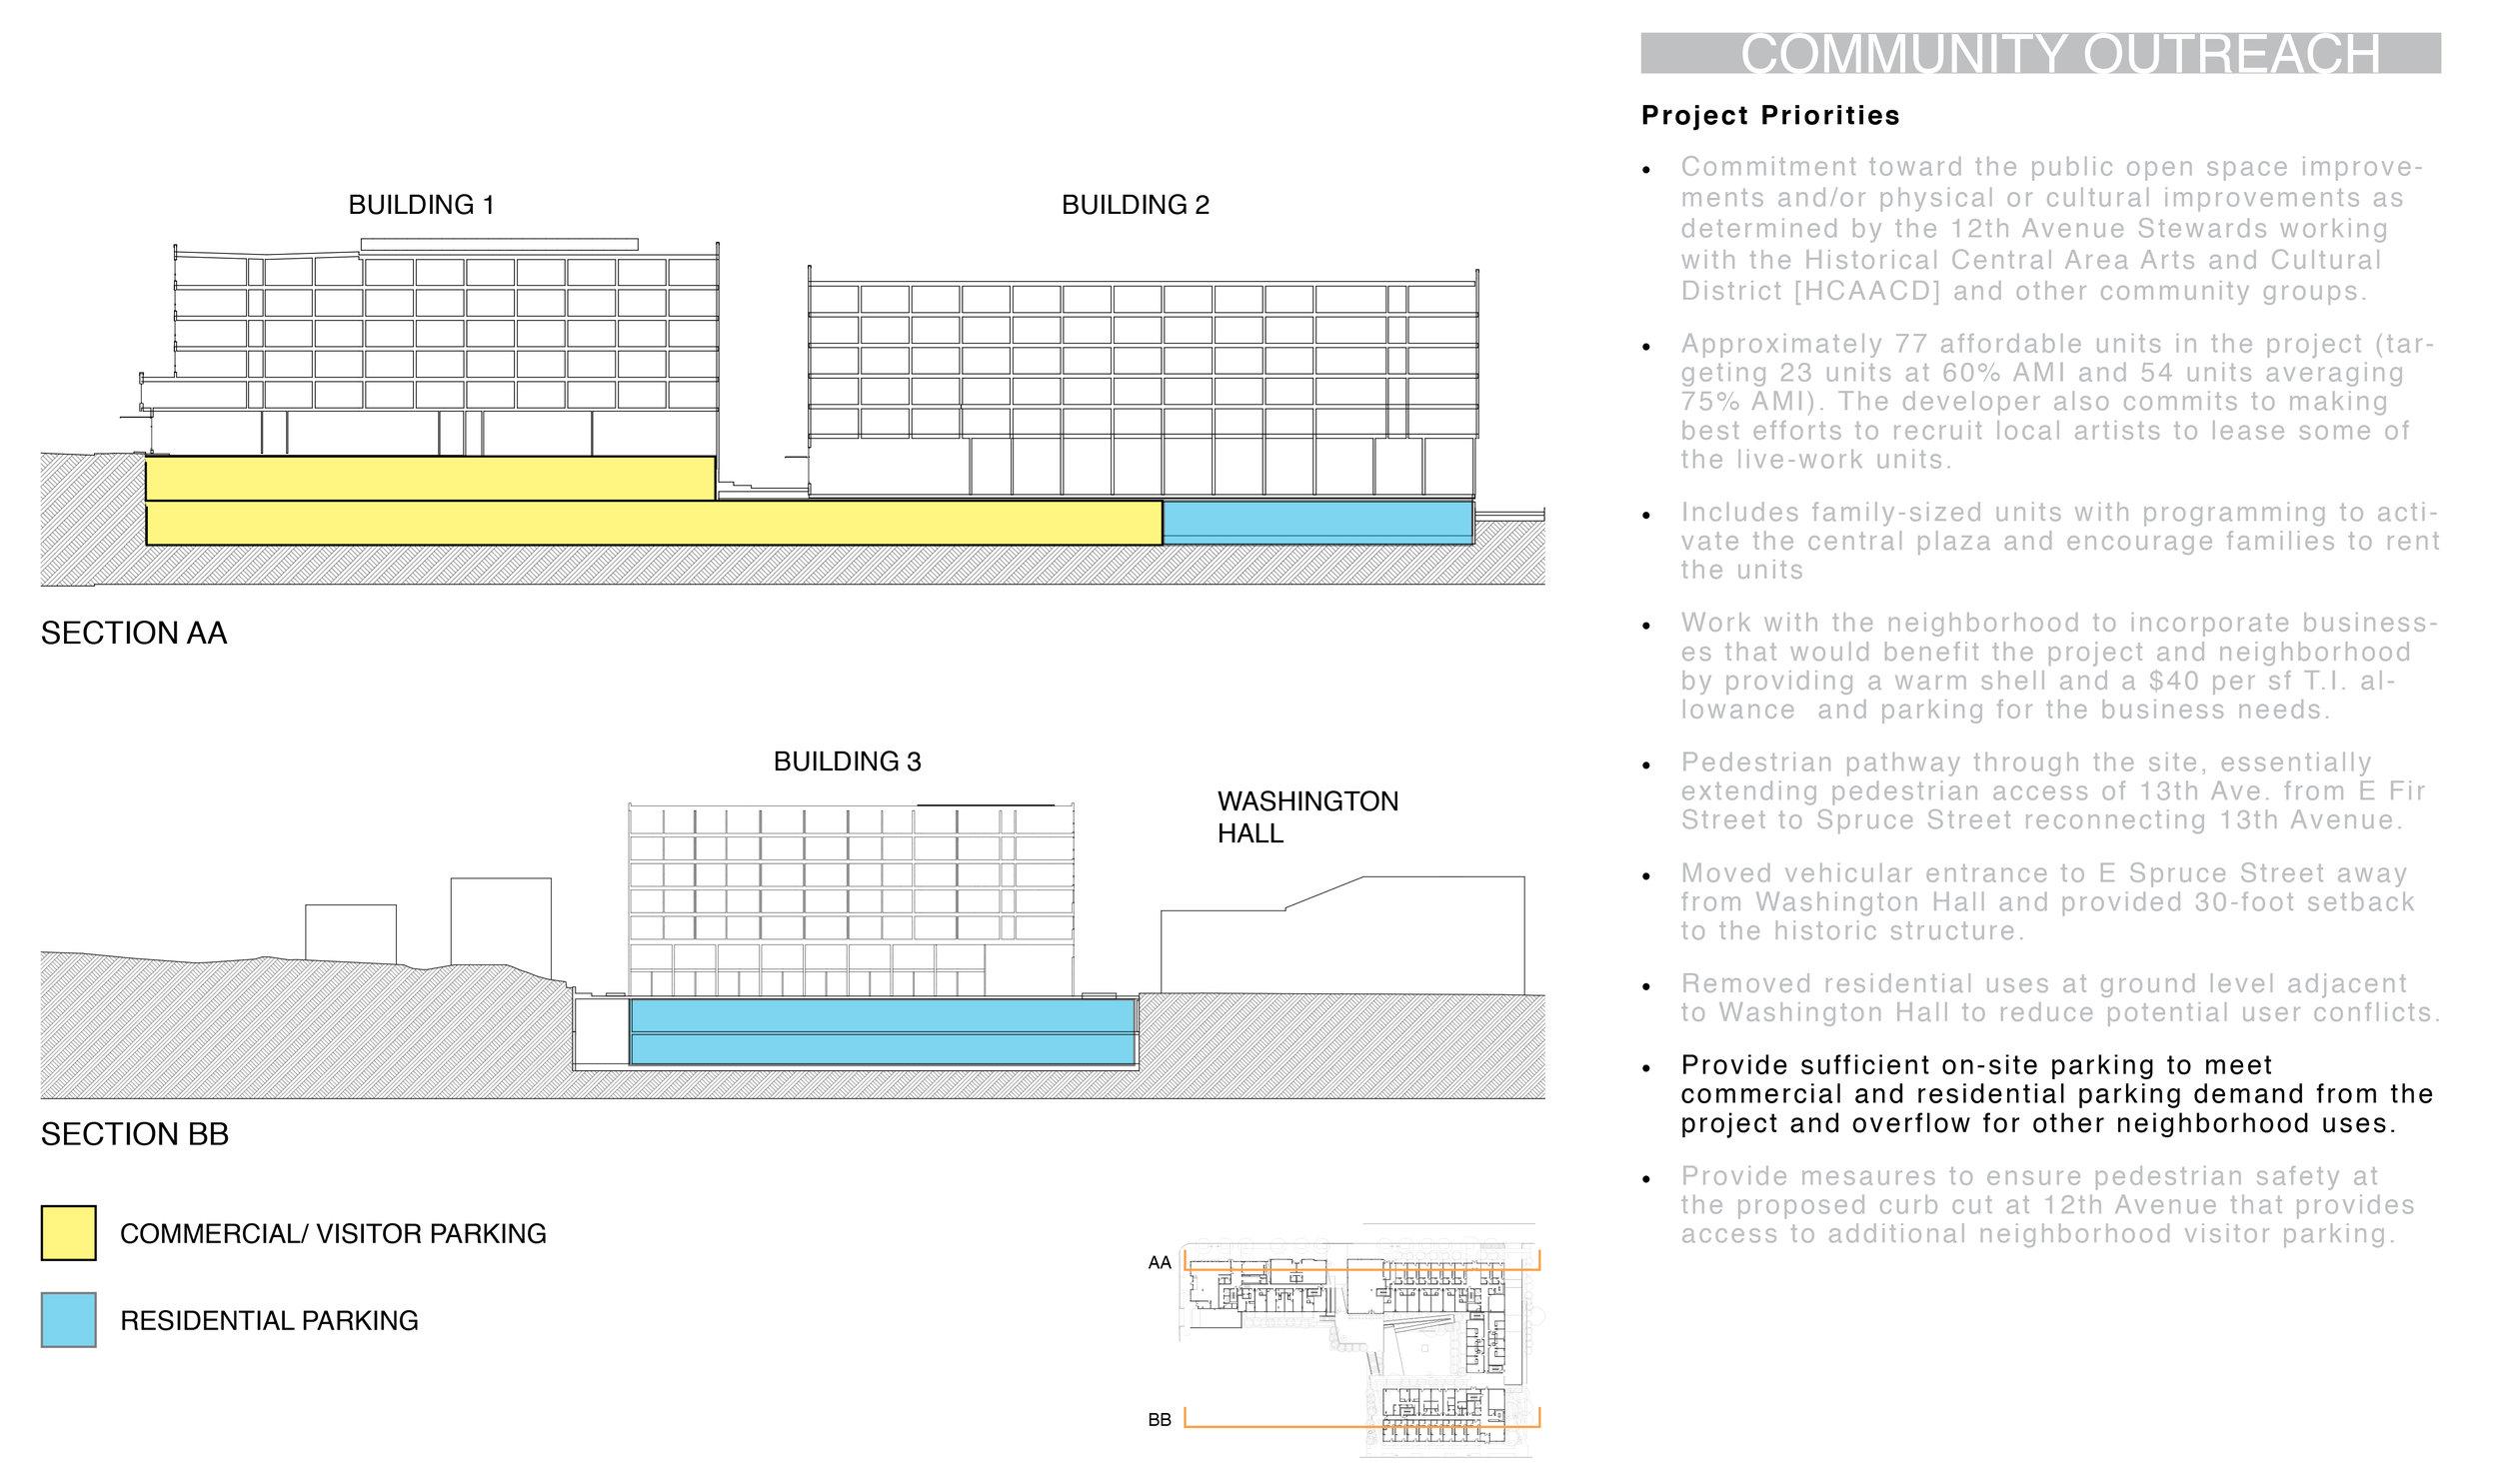 COMMUNITYOUTREACH_0007_2016.08.24_FCS_Mup Slide Show_FINAL 22.pdf.jpg